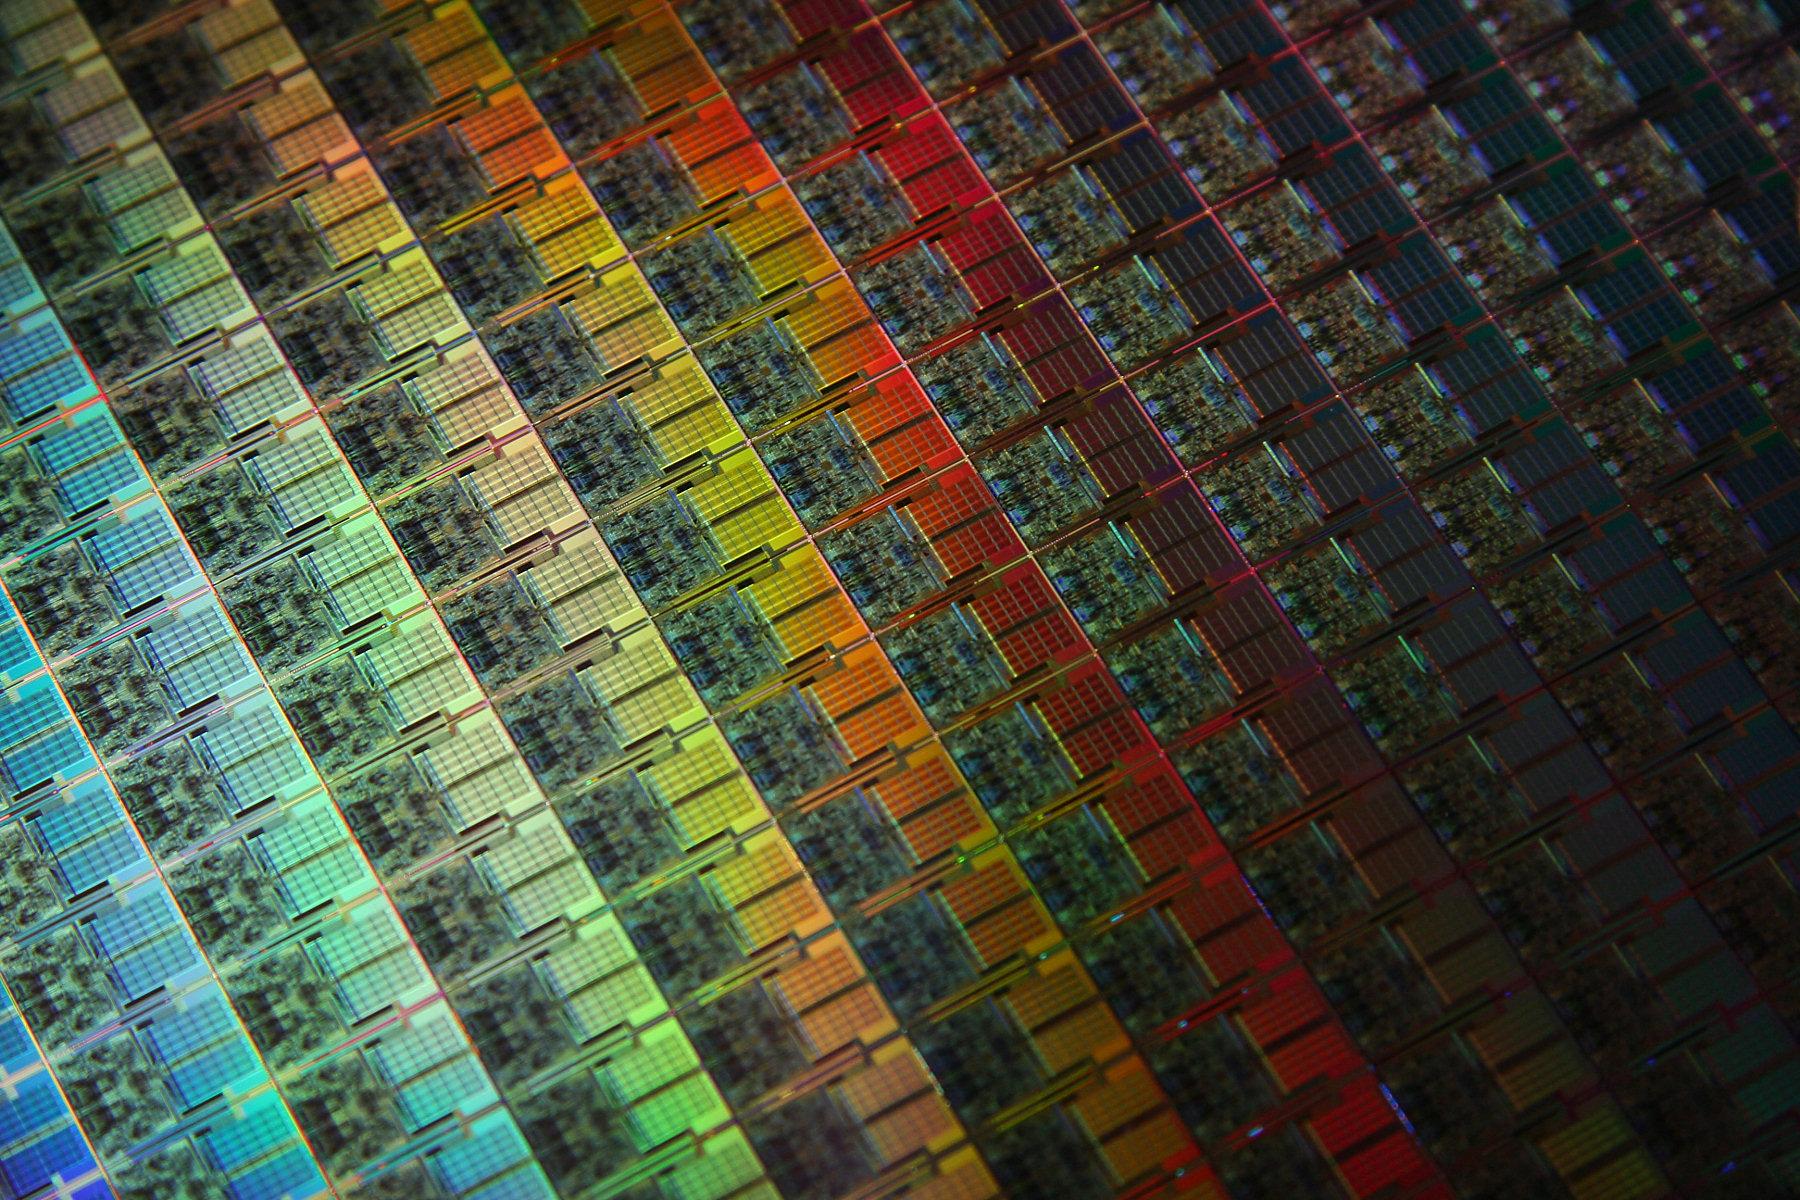 HD Desktop Technology Wallpaper Backgrounds For Download 1800x1200